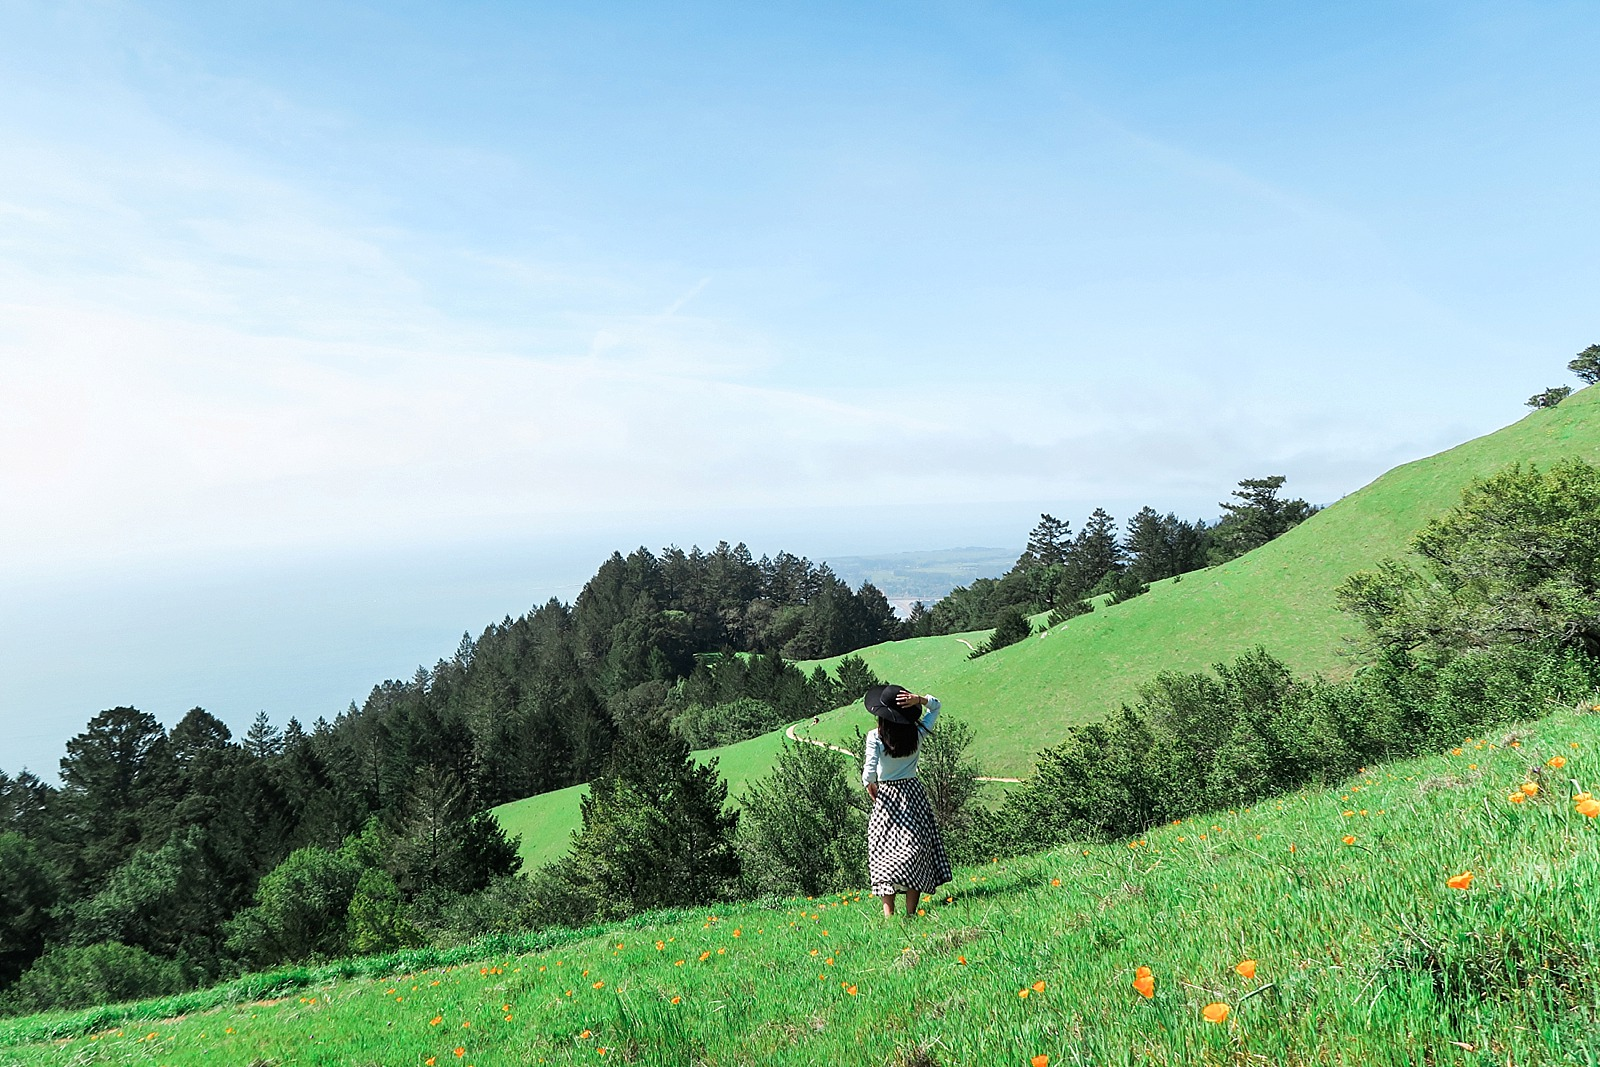 diana-elizabeth-coastal-trail-hike-miles-davis-trail-stenson-beach-0249